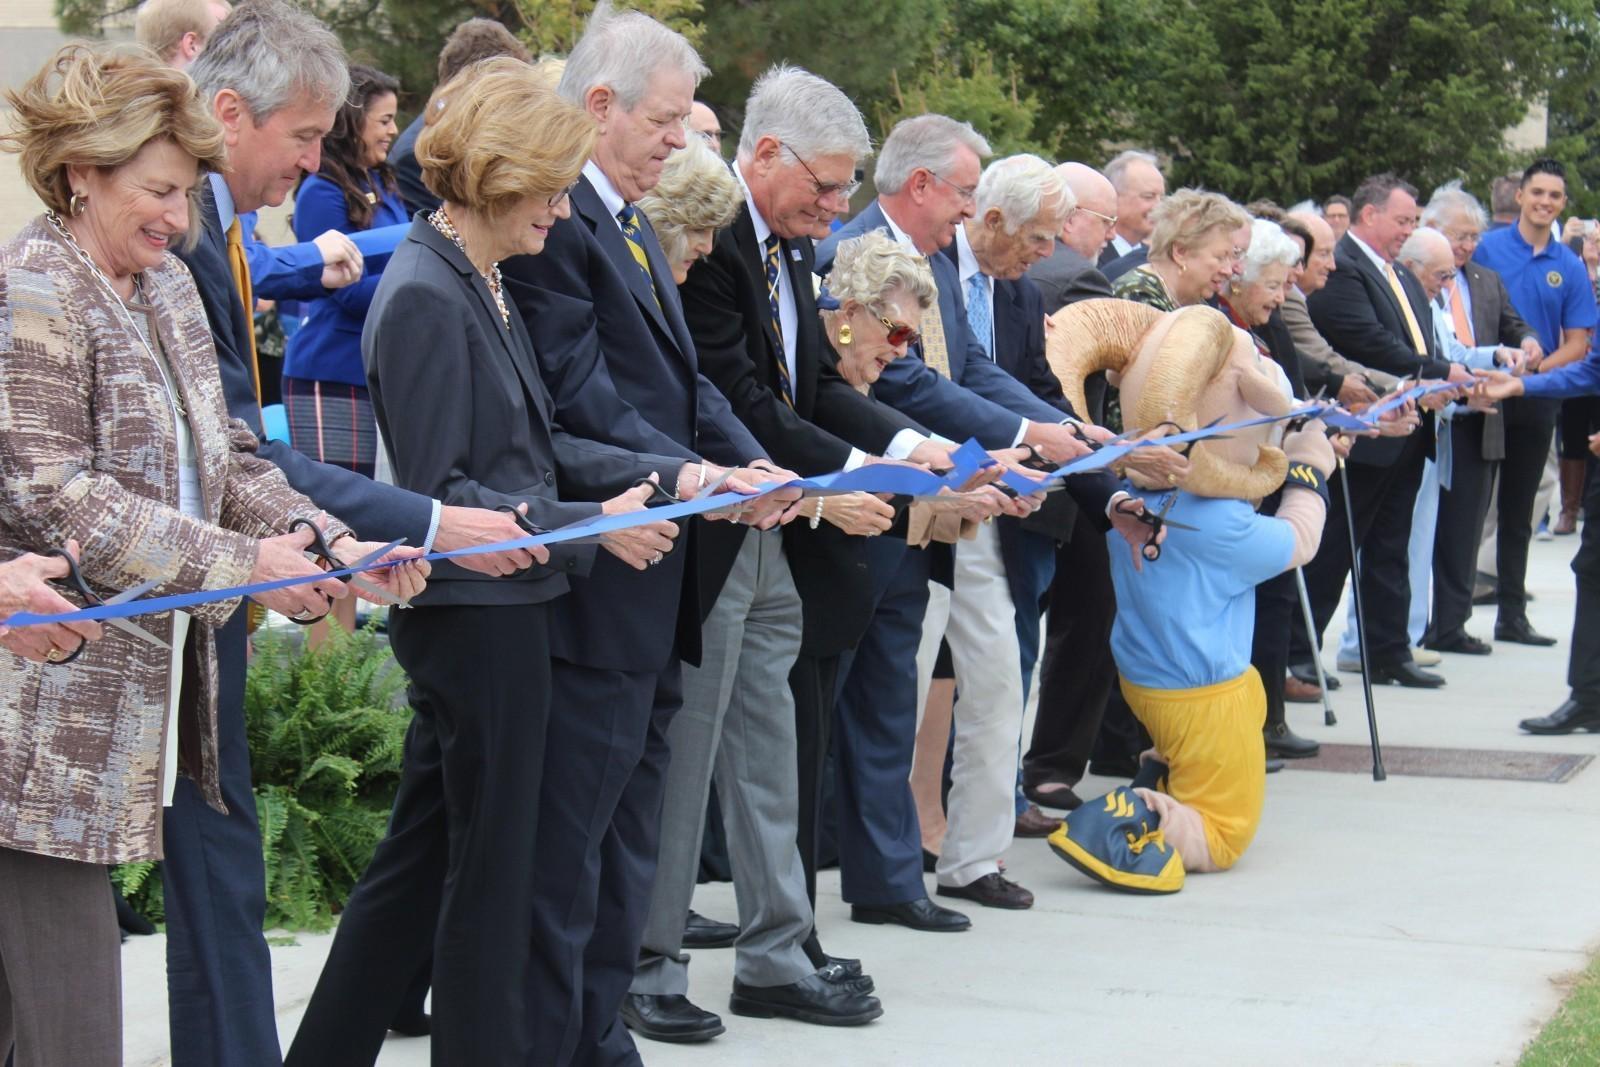 Rosedale Renaissance dedication ceremony celebrates revitalization to Wesleyan campus